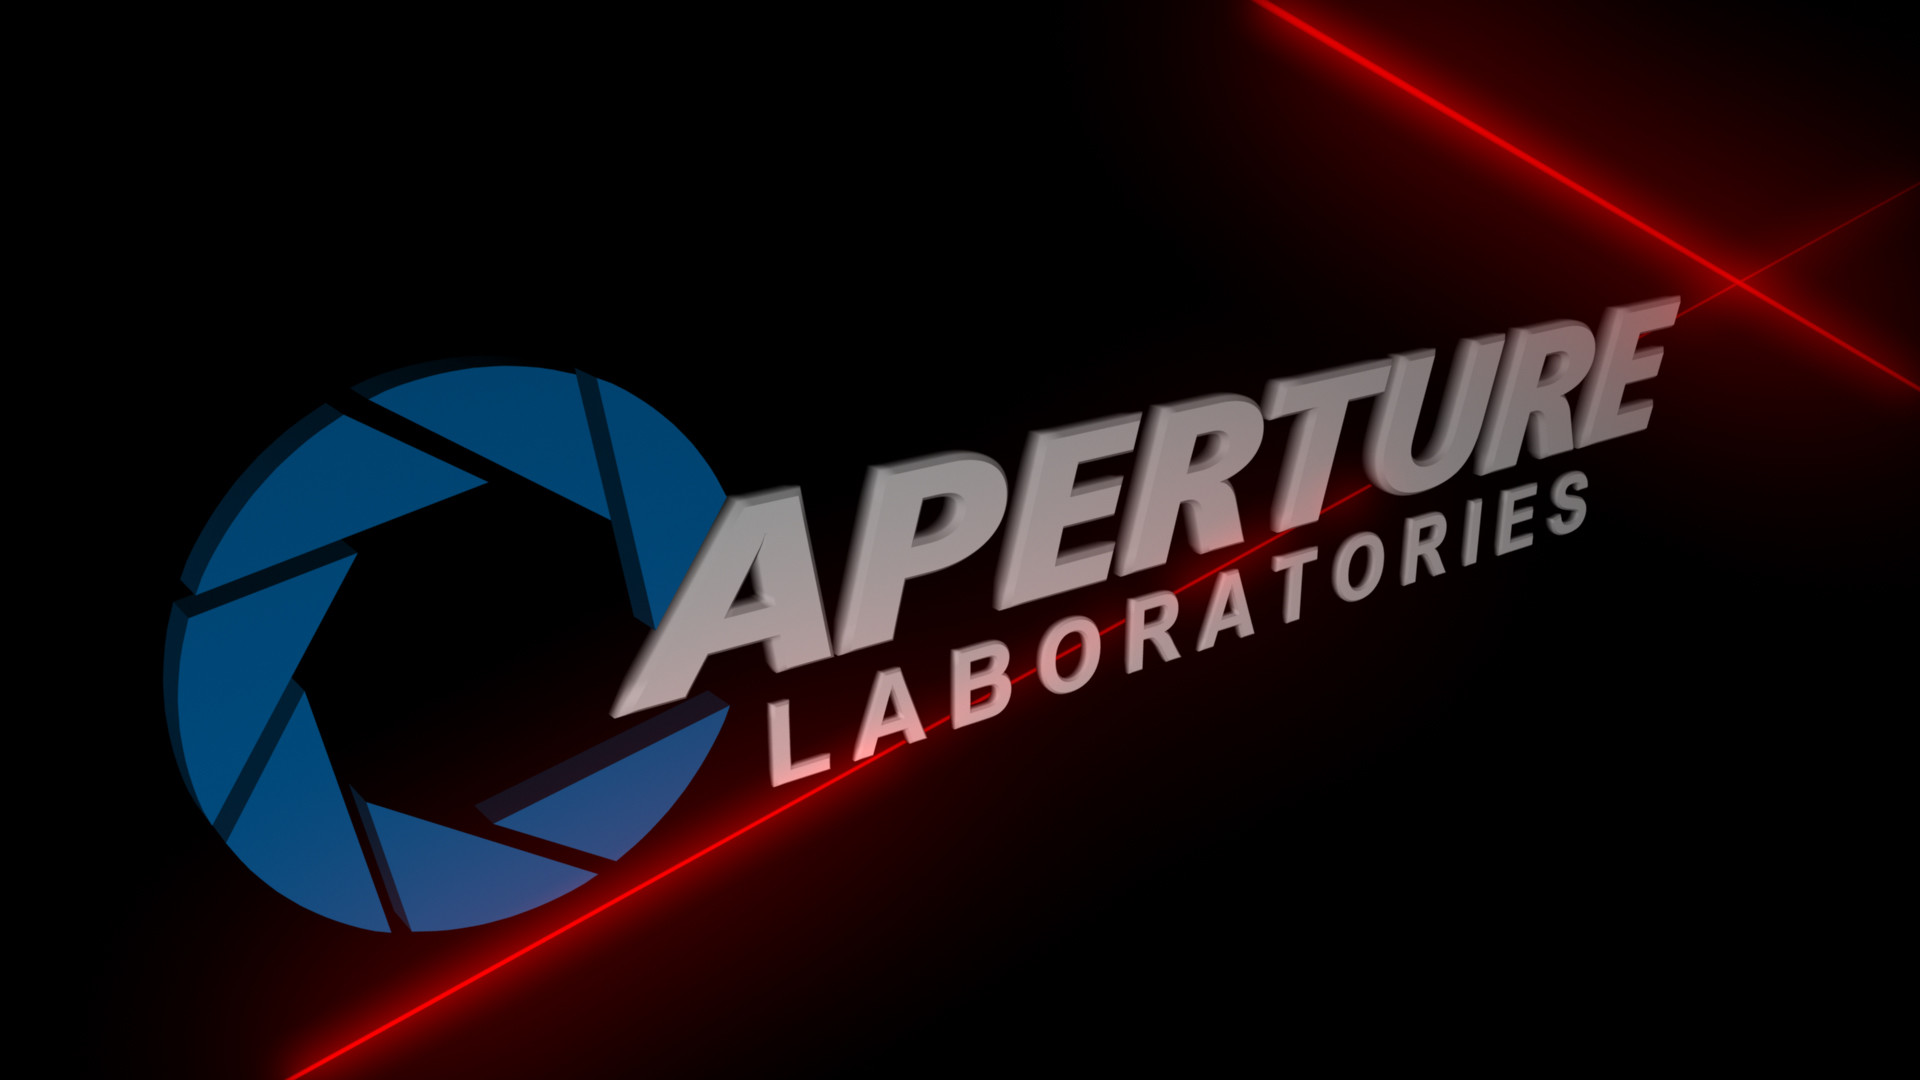 Aperture Science Logo by striker109 Aperture Science Logo by striker109